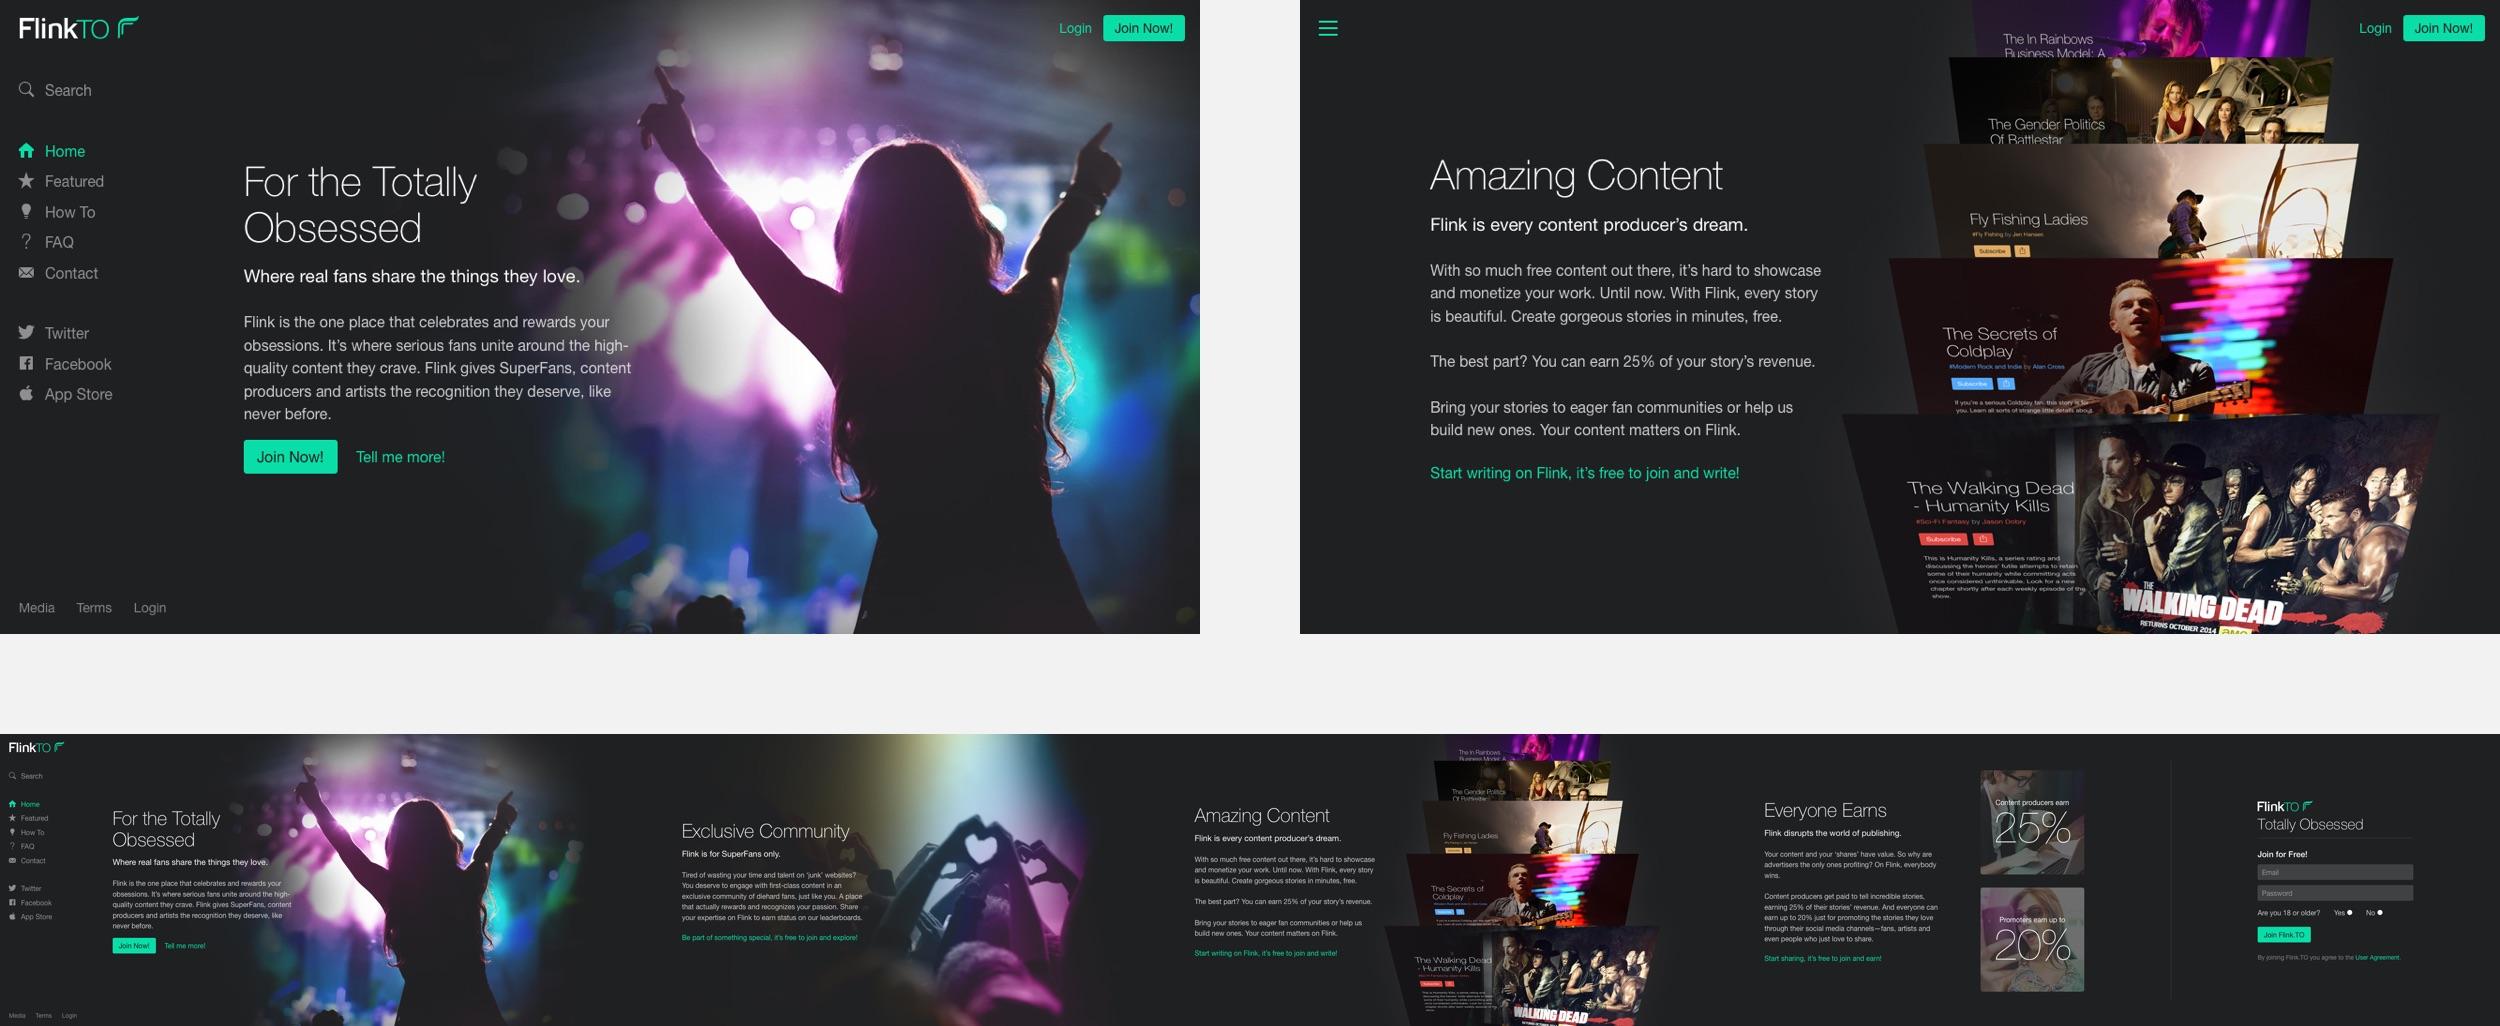 The final FlinkTO promo site.